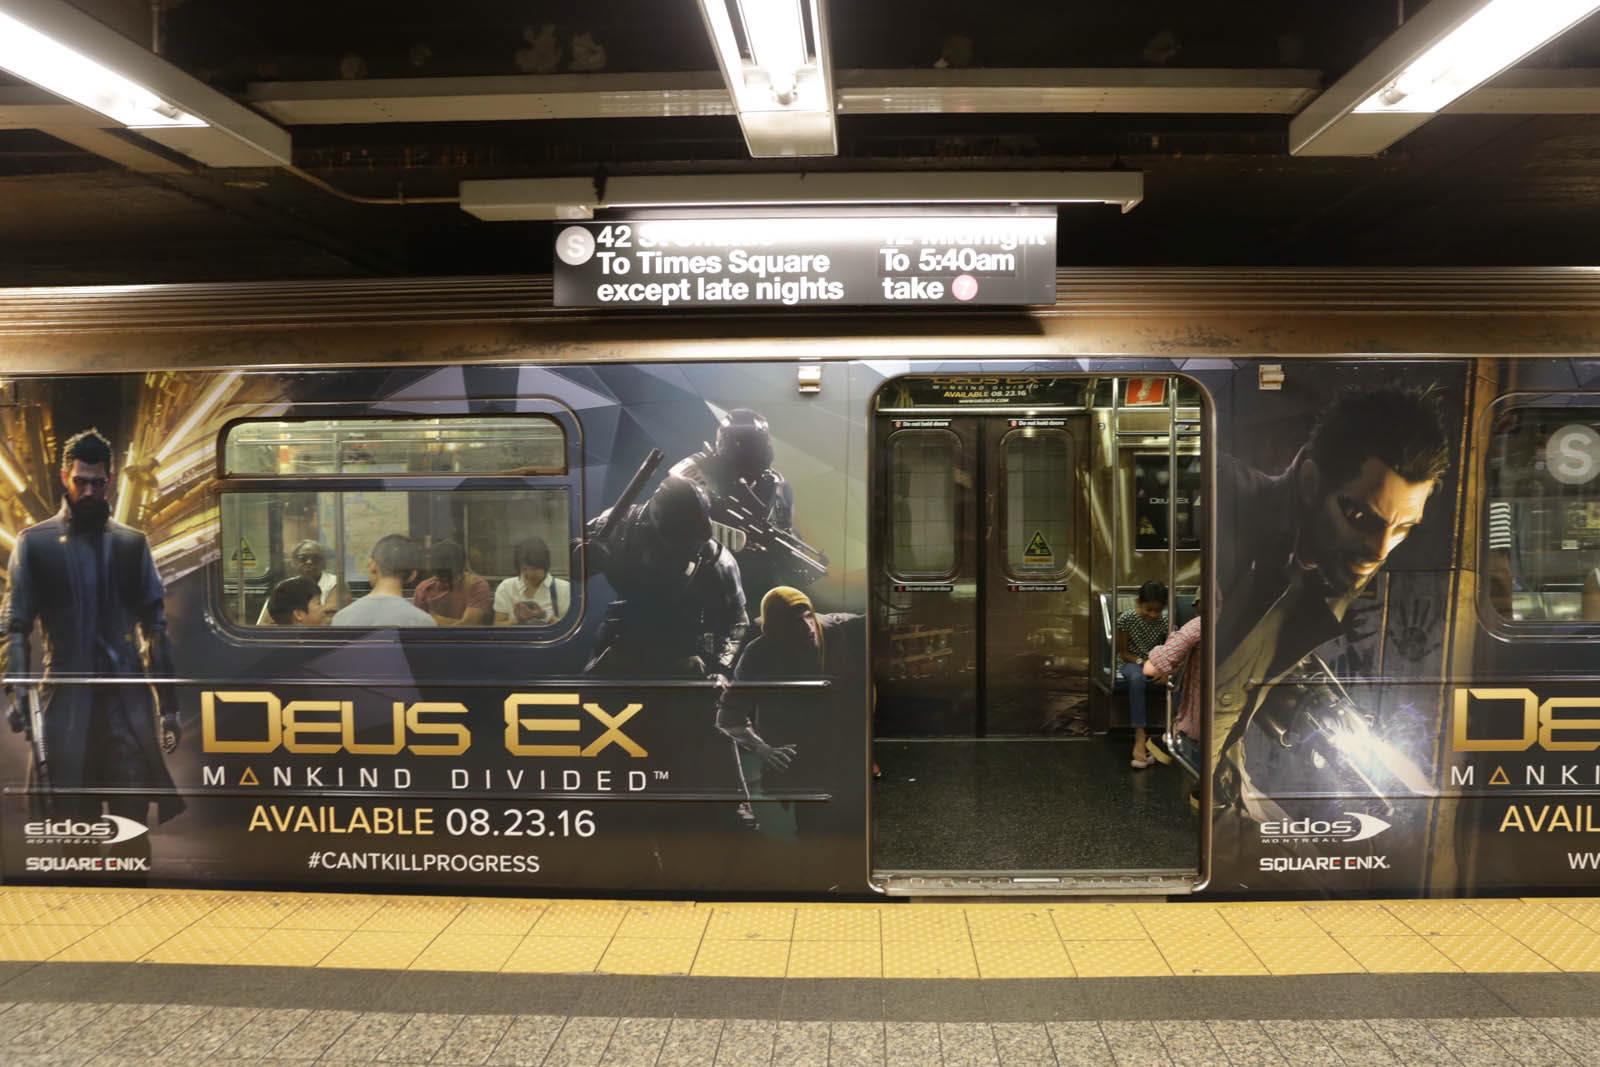 New Yorkem se prohání vlak metra s motivy Deus Ex: Mankind Divided 128574